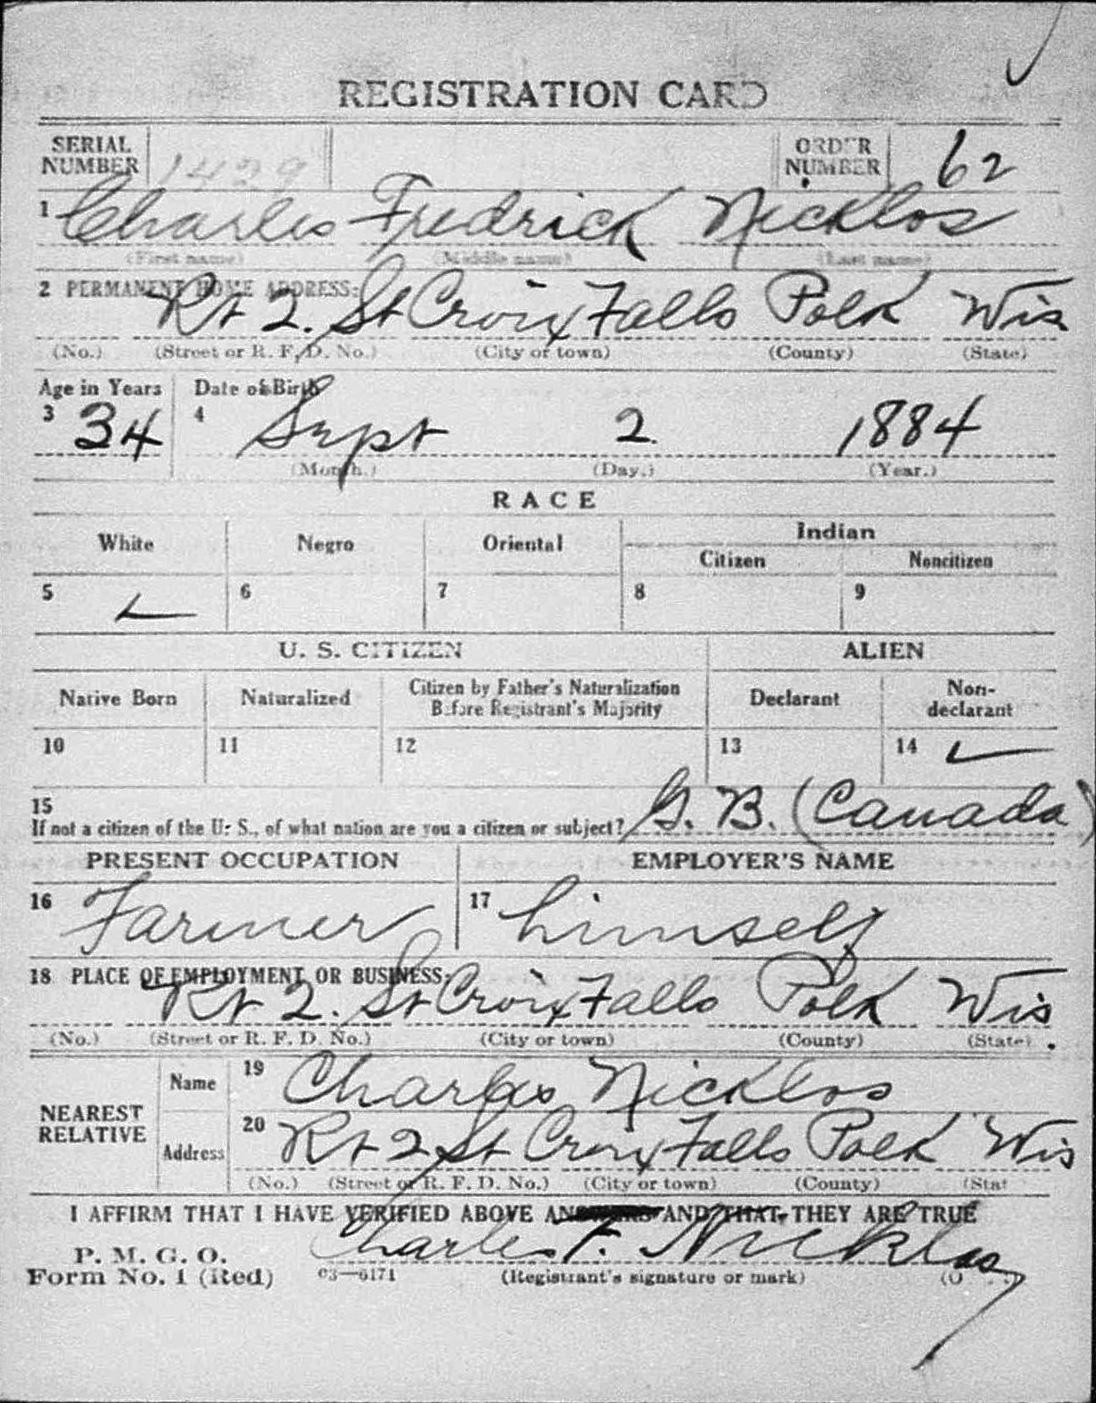 Charles Fredrick Nicklos WW1 Draft Card